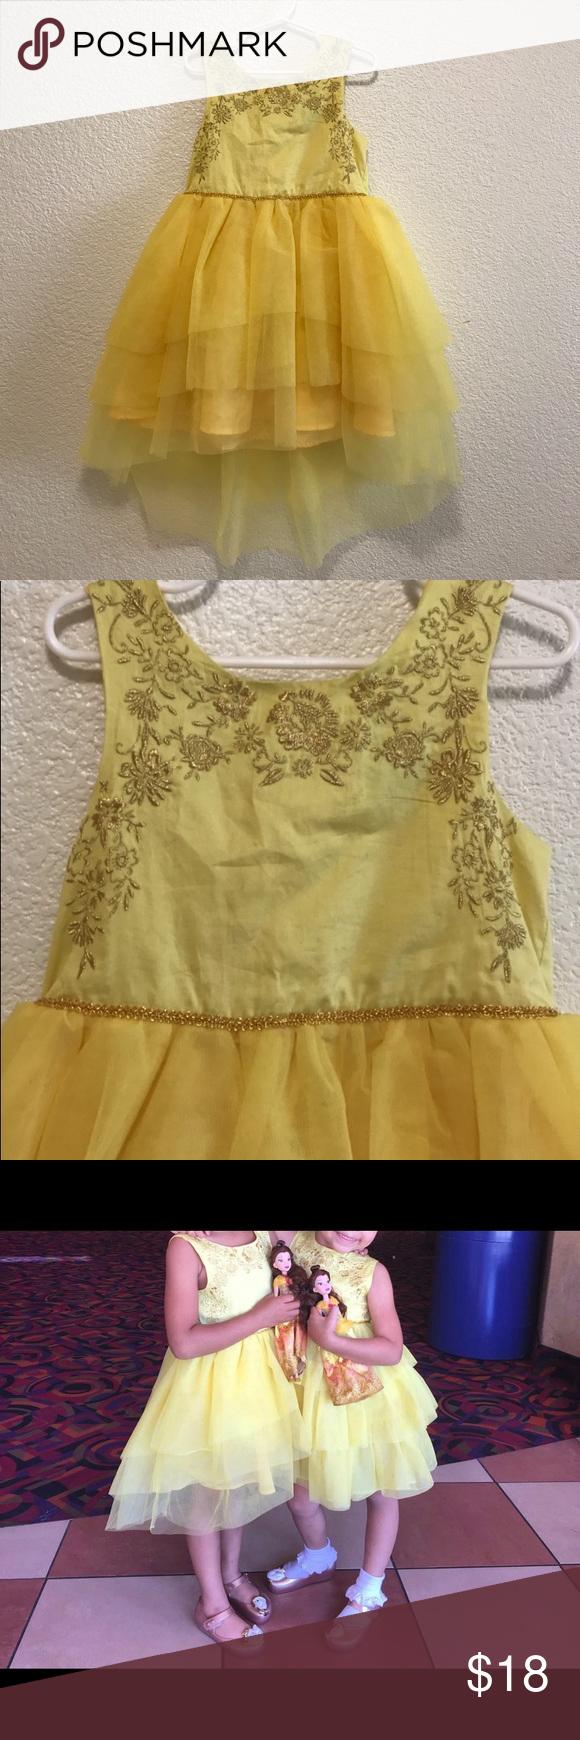 Belle Dress From Target Size Xs 4 5 Belle Dress Dresses Disney Dresses [ 1740 x 580 Pixel ]